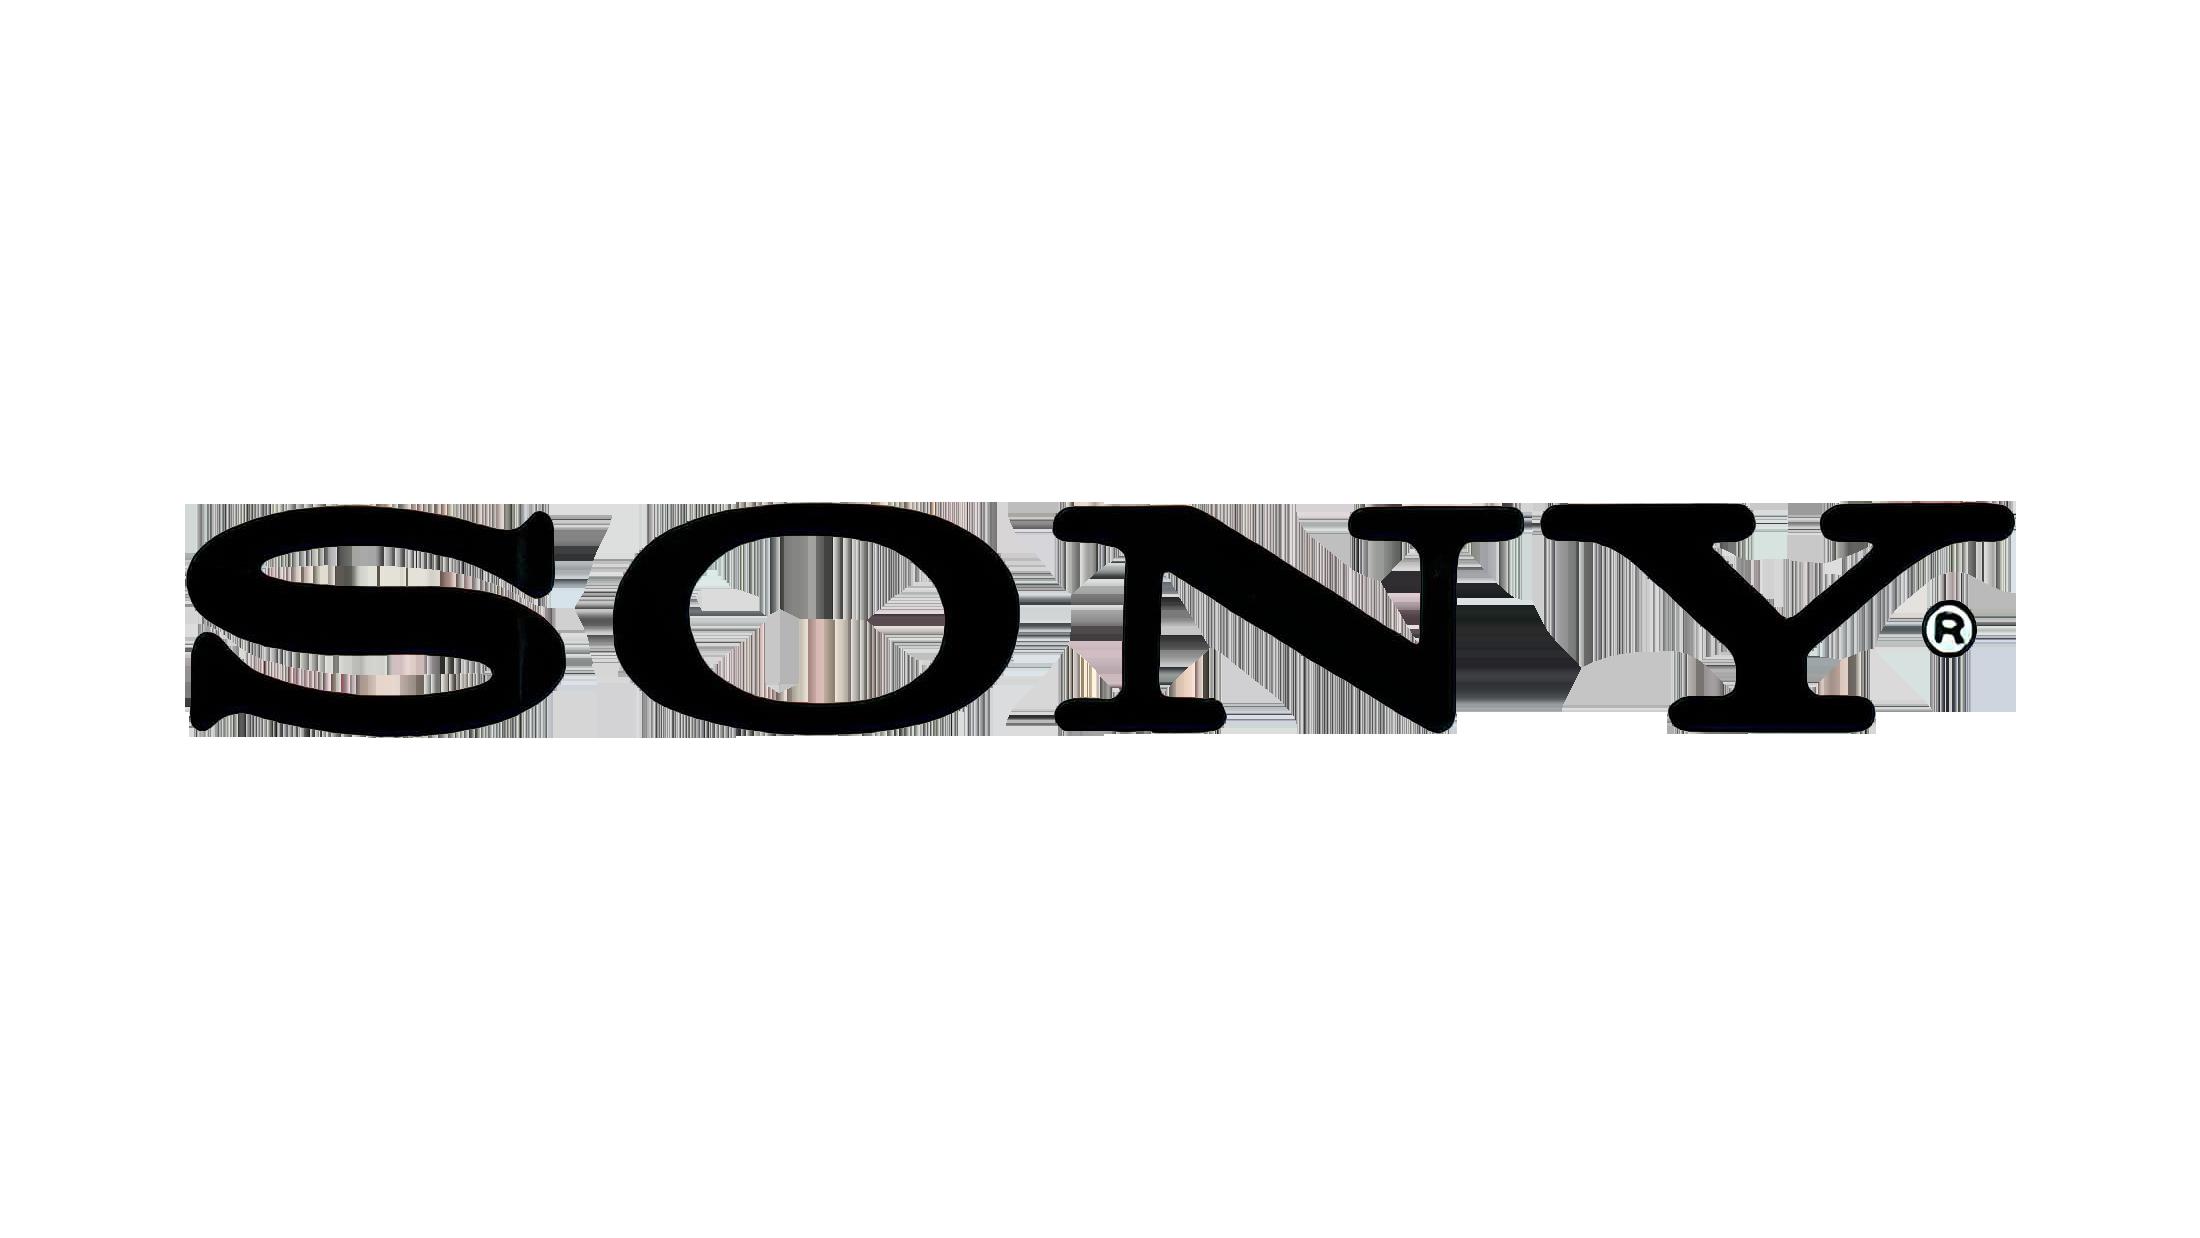 sony, tv, television